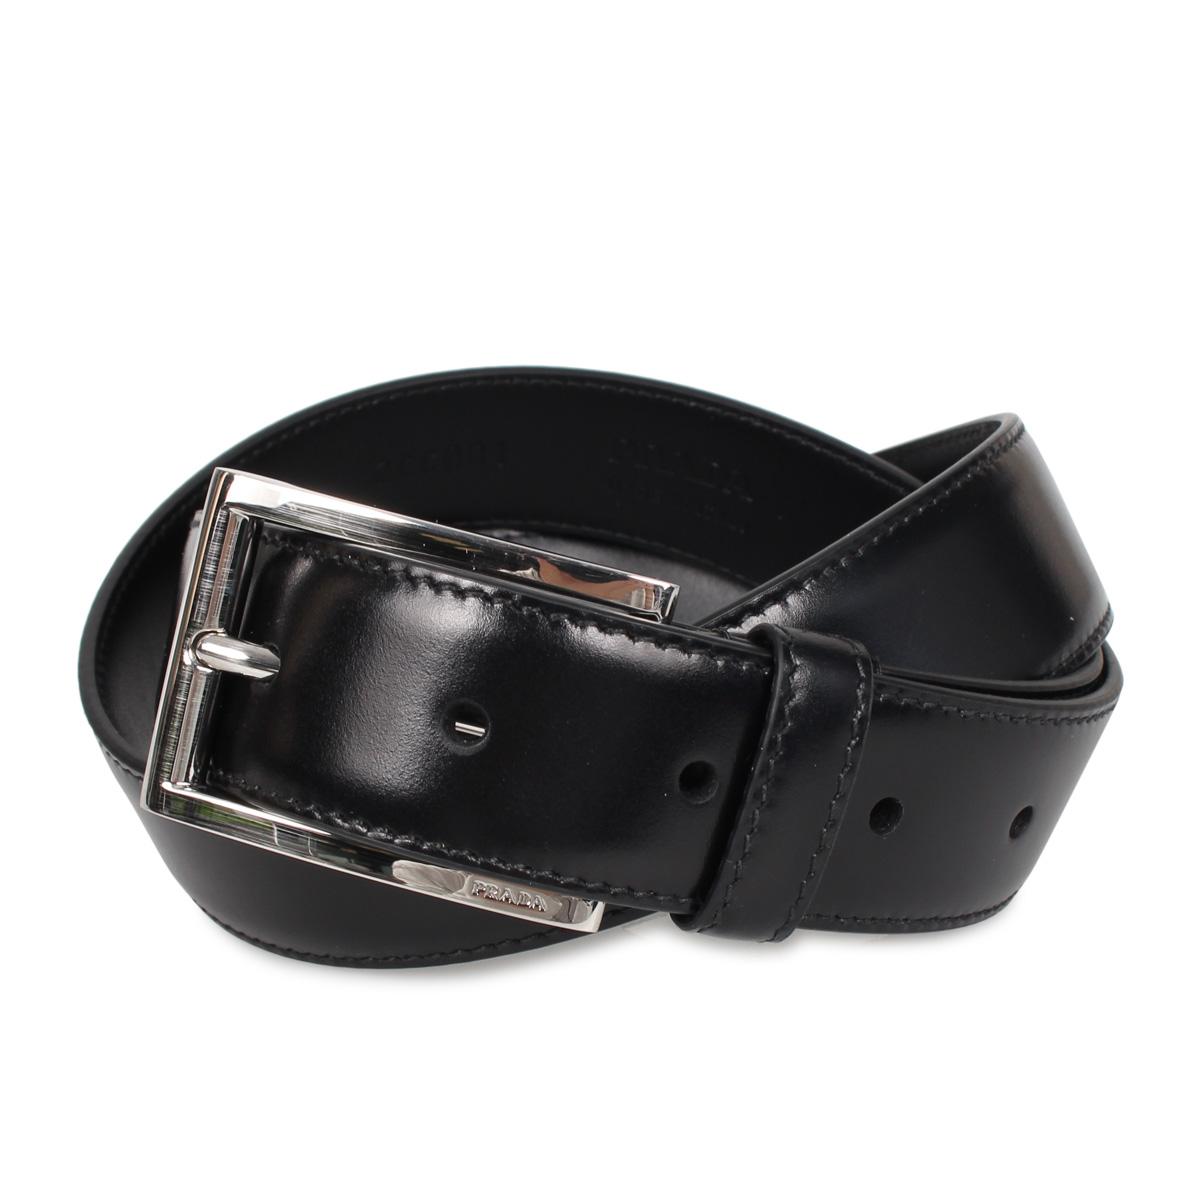 PRADA VITELLO LUX プラダ ベルト レザーベルト メンズ ブラック 黒 2CC001-X72